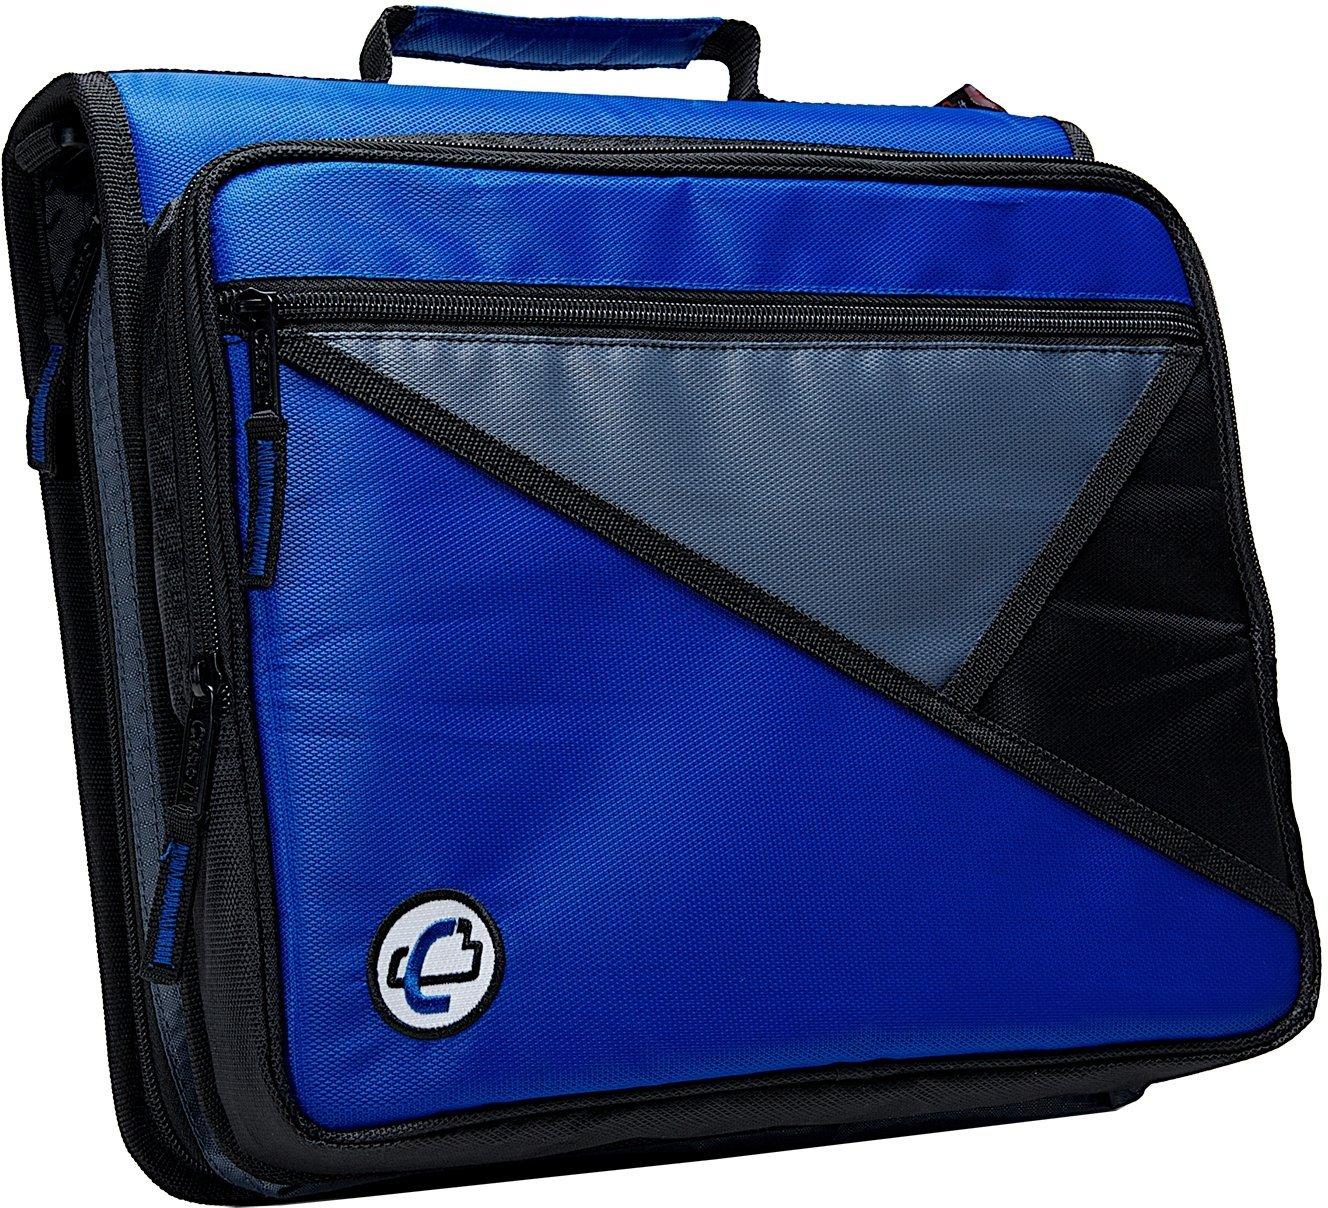 Case-it The Universal 2-Inch Blue Zipper Binder 3-Ring